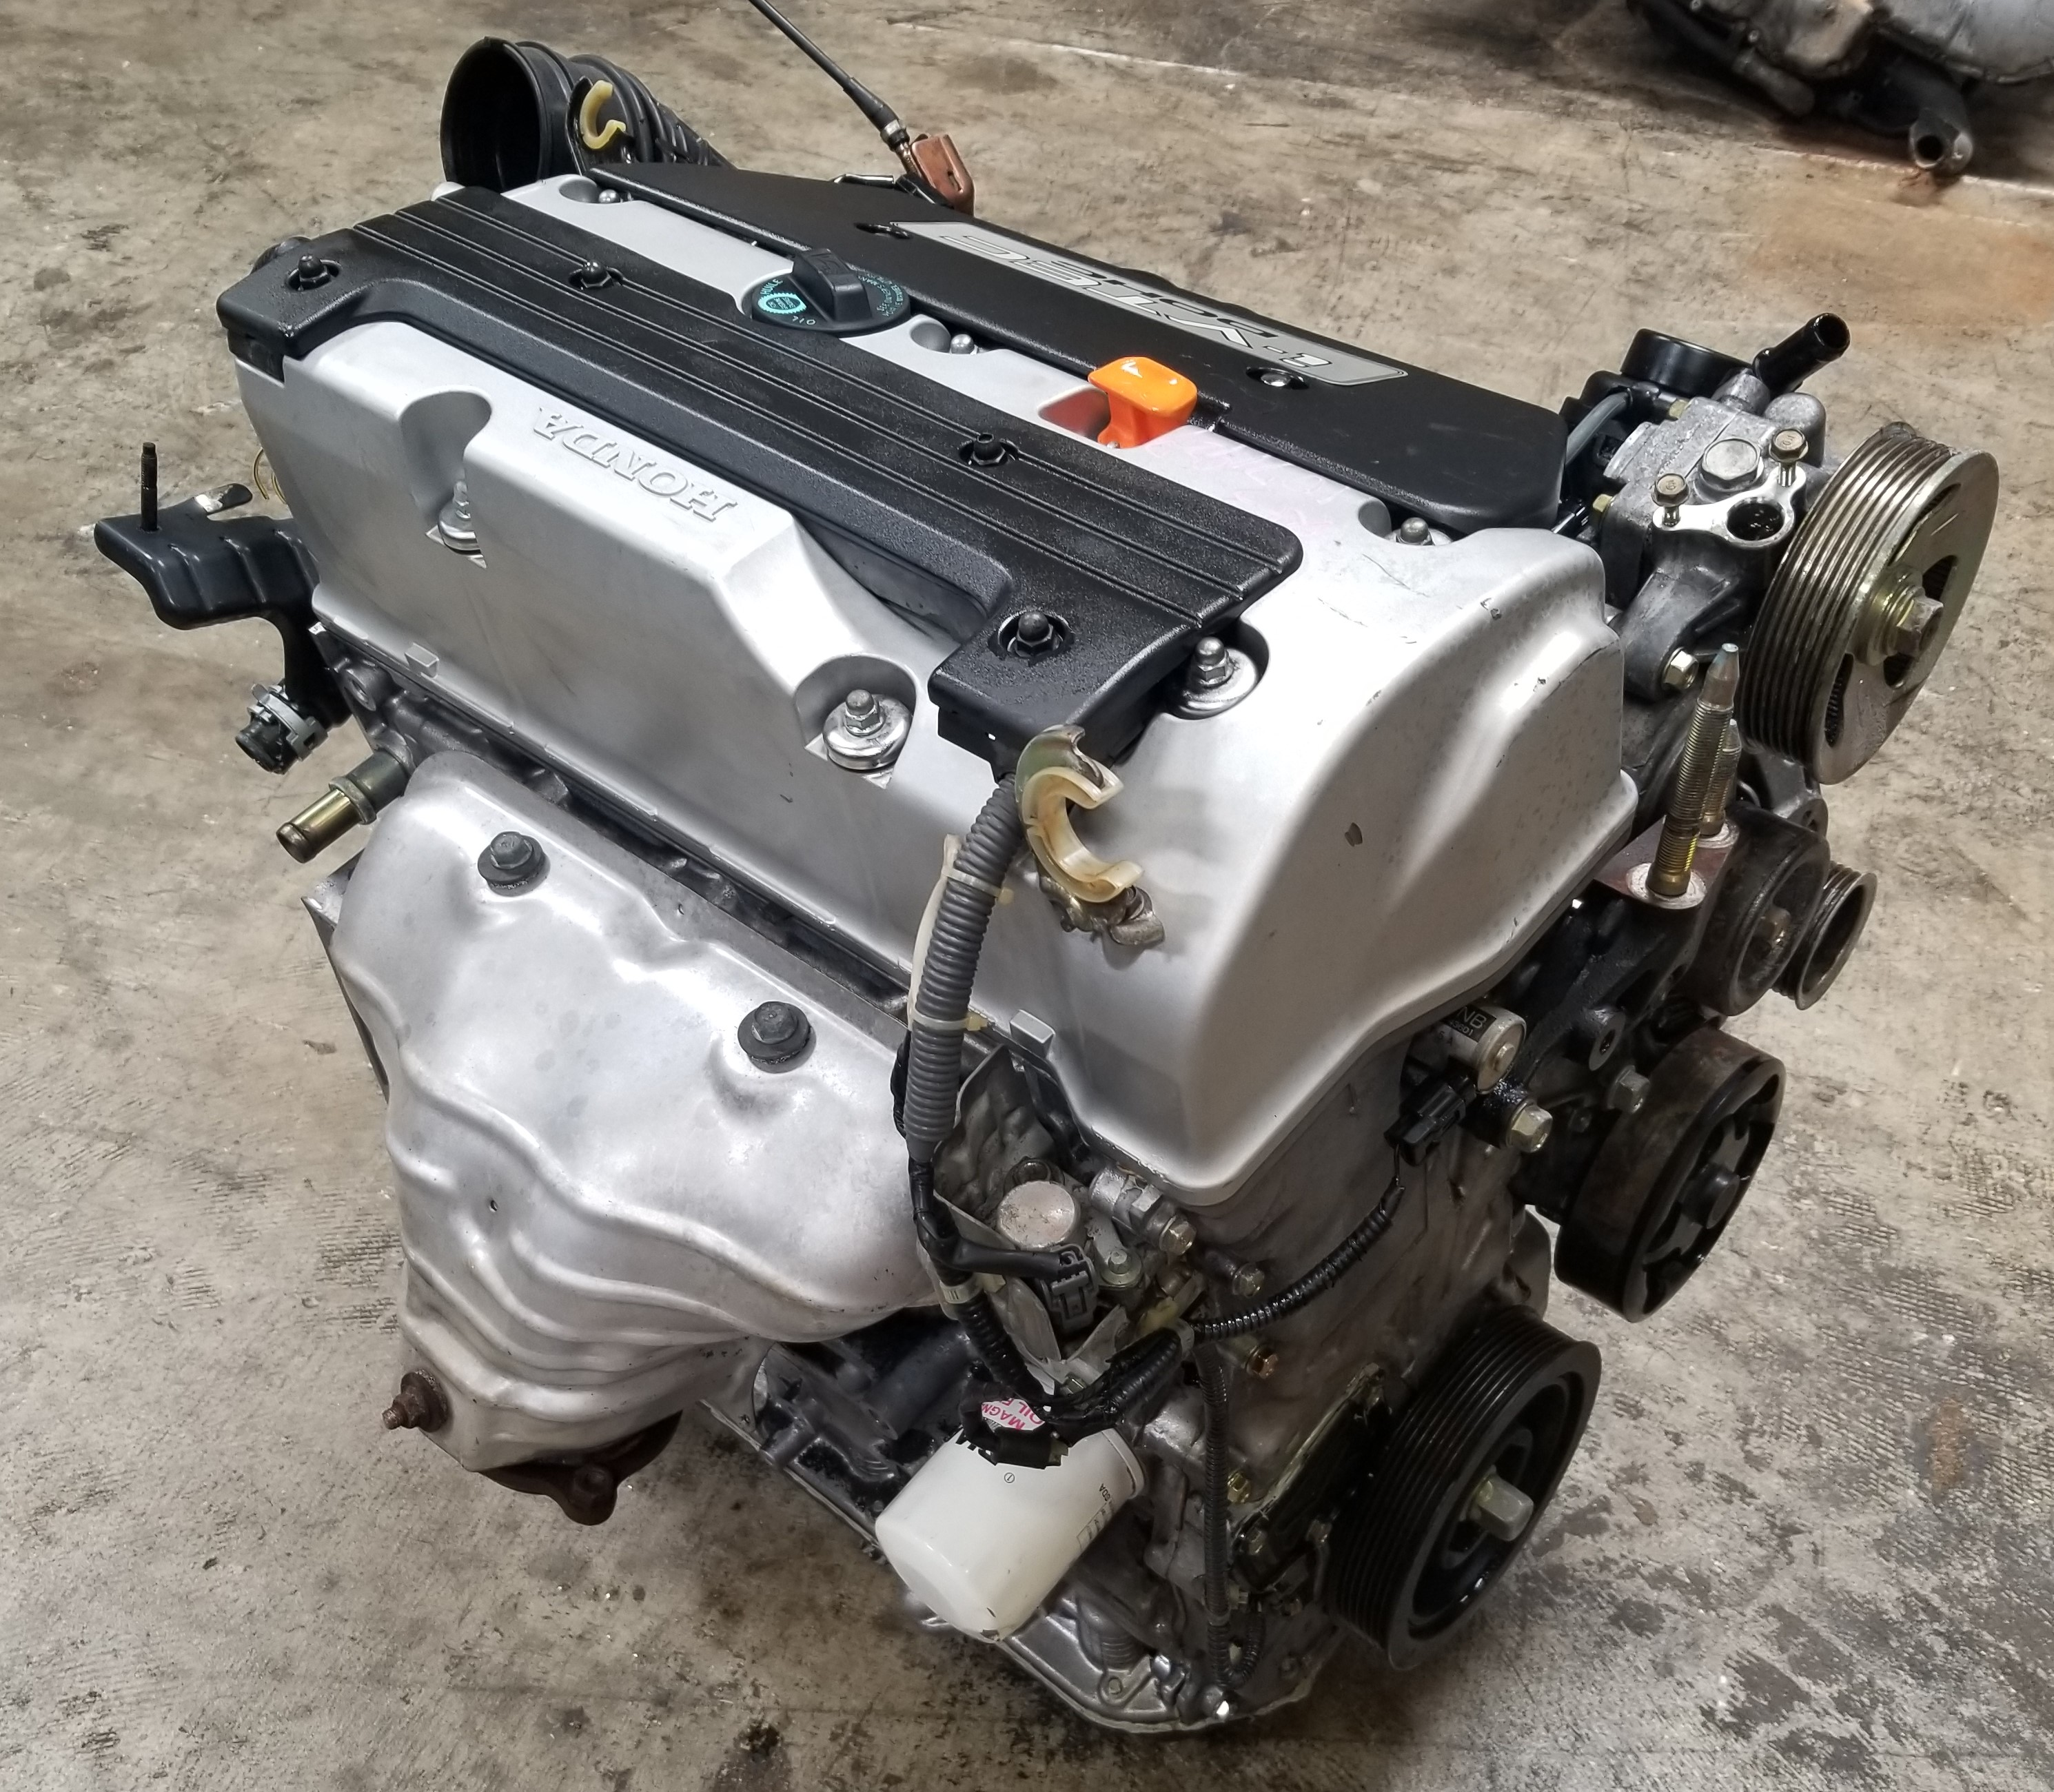 K20 2002-2006 ACURA RSX BASE CIVIC SI 2.0 ENGINE JDM K20A